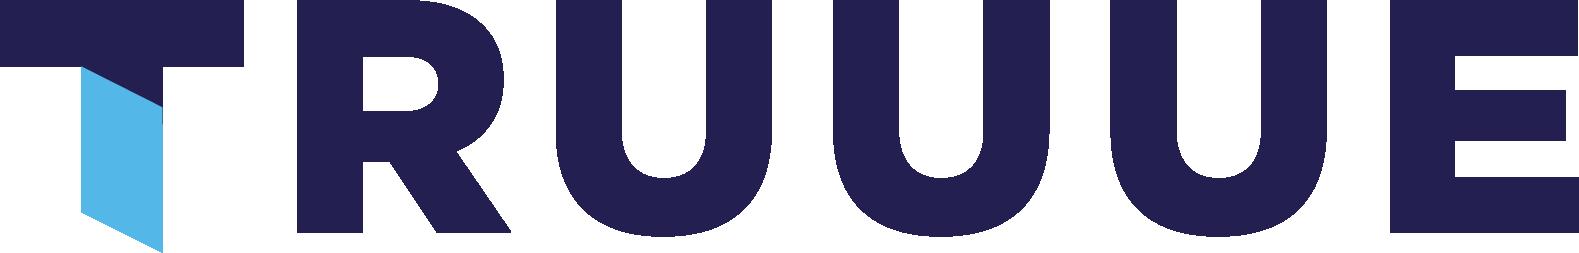 JTC e-Bidding, powered by Truuue